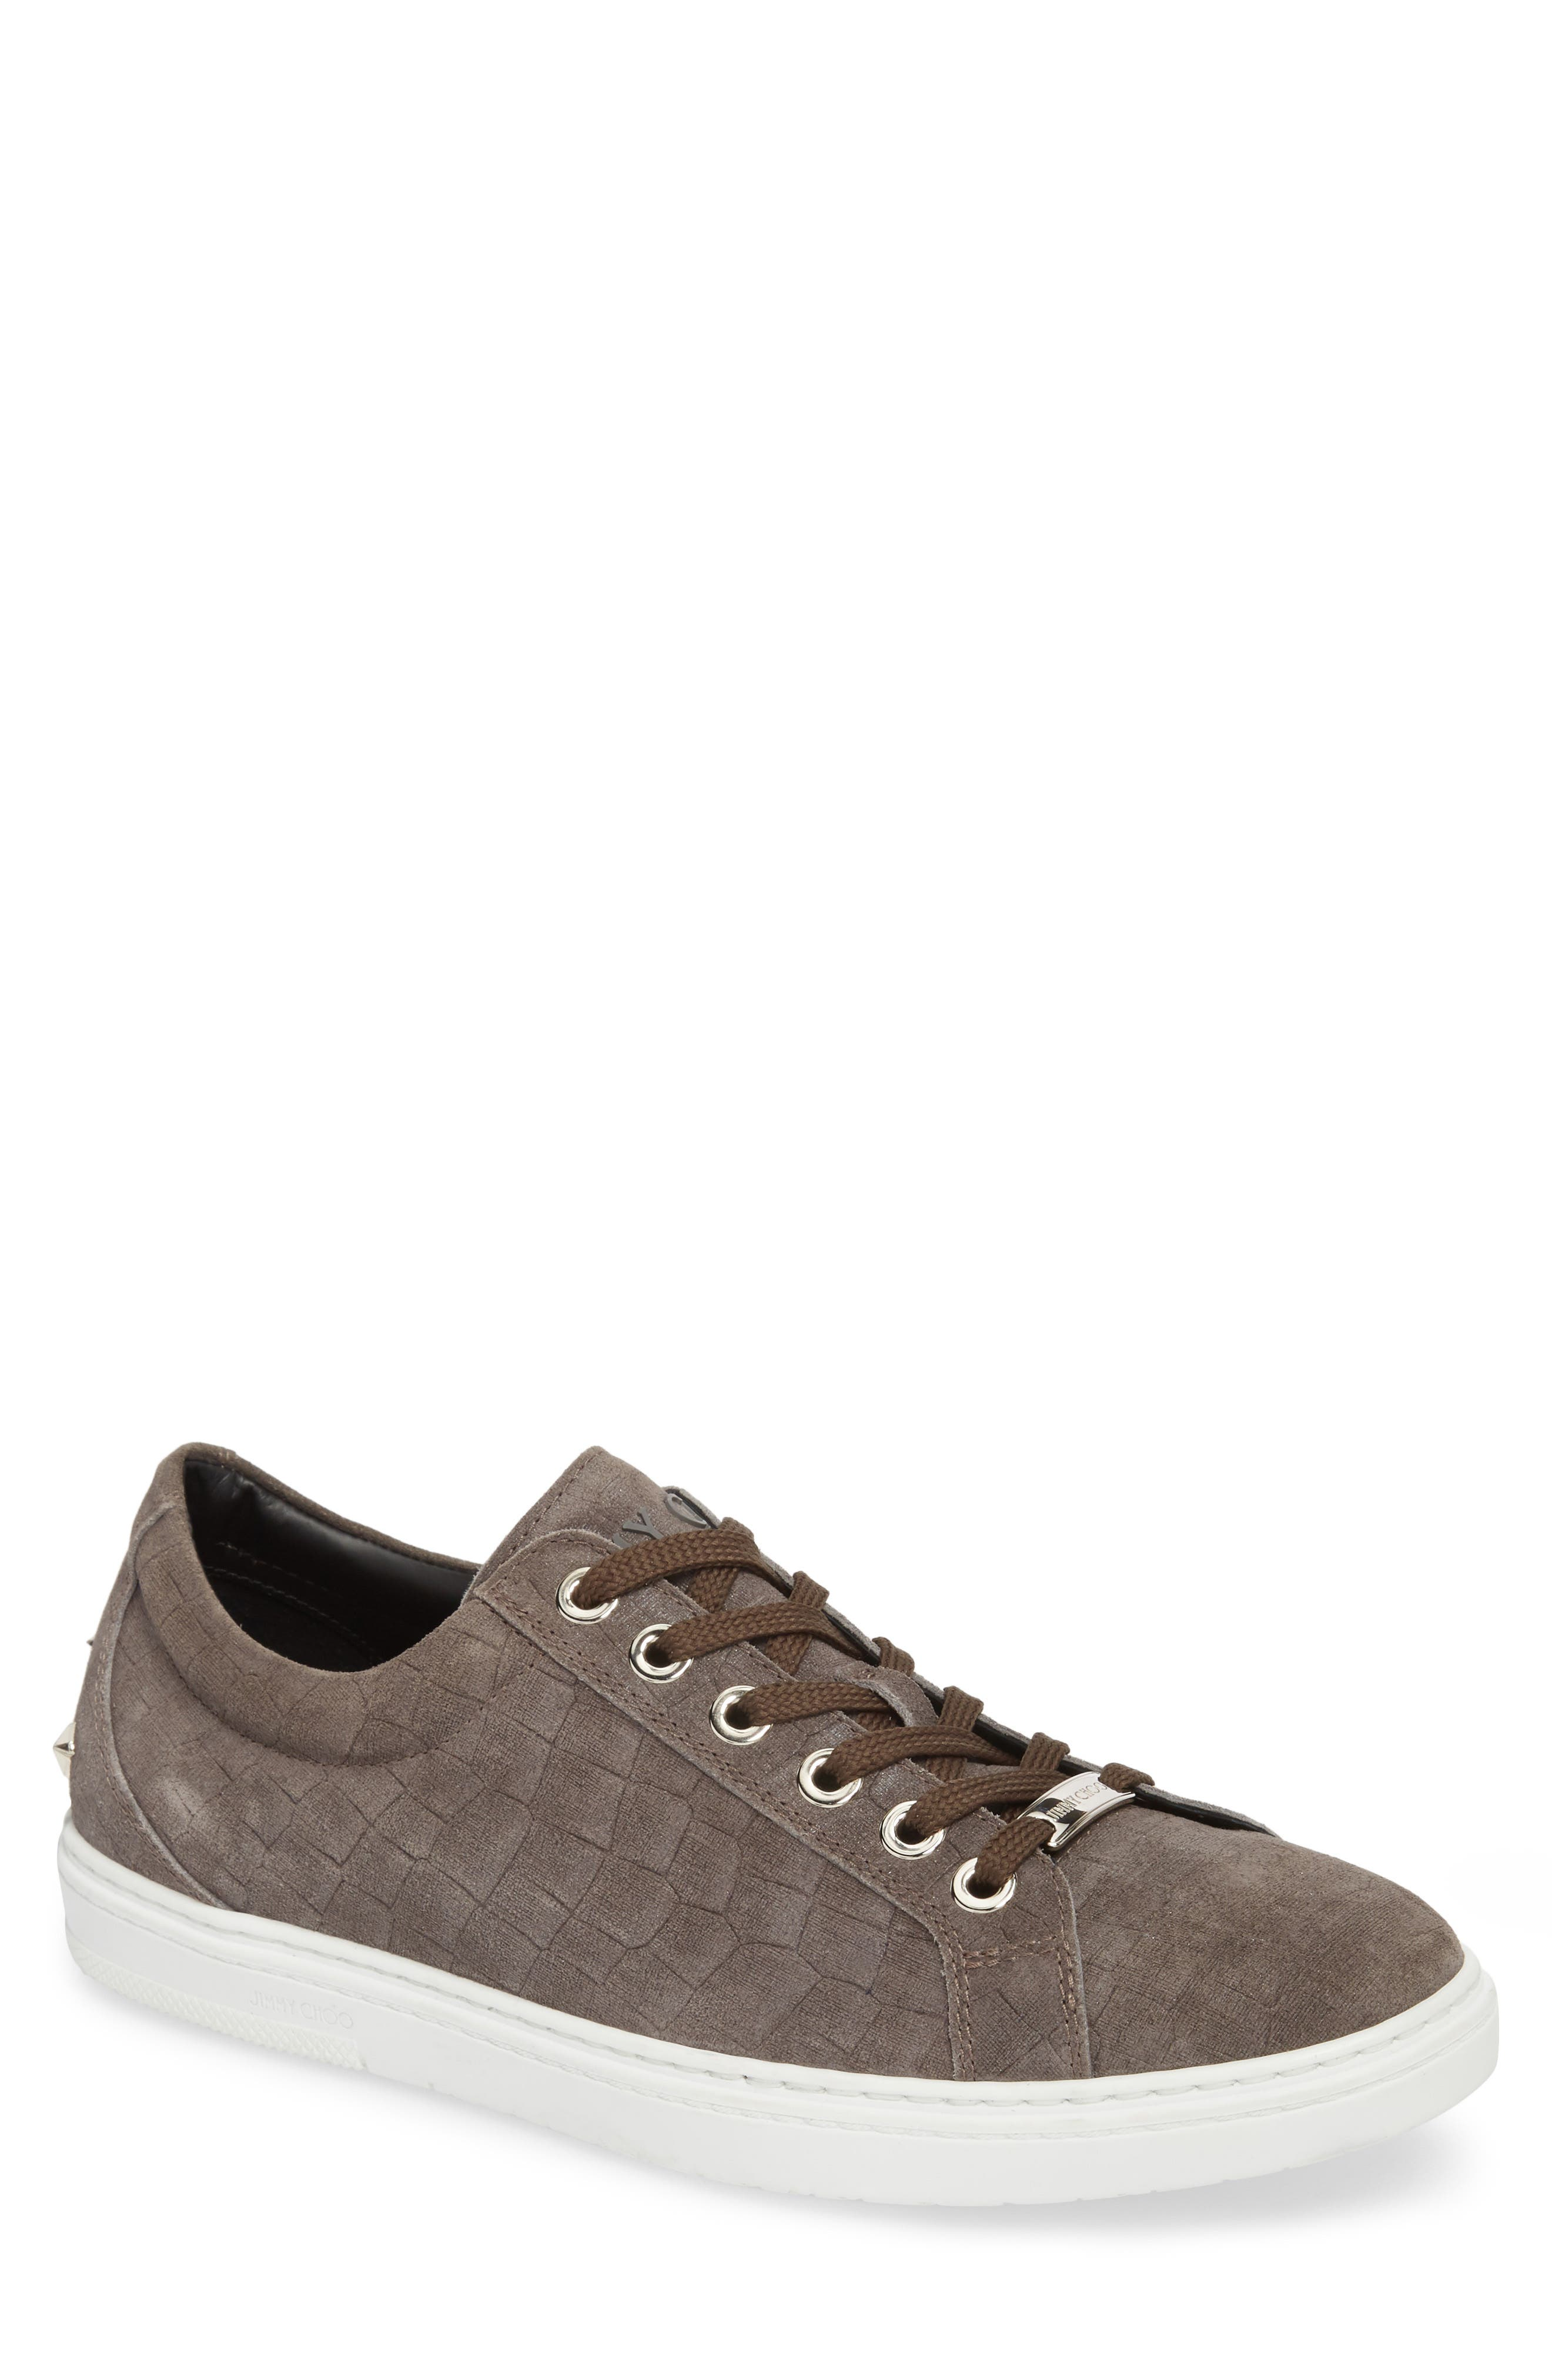 Cash Sneaker,                         Main,                         color, 021